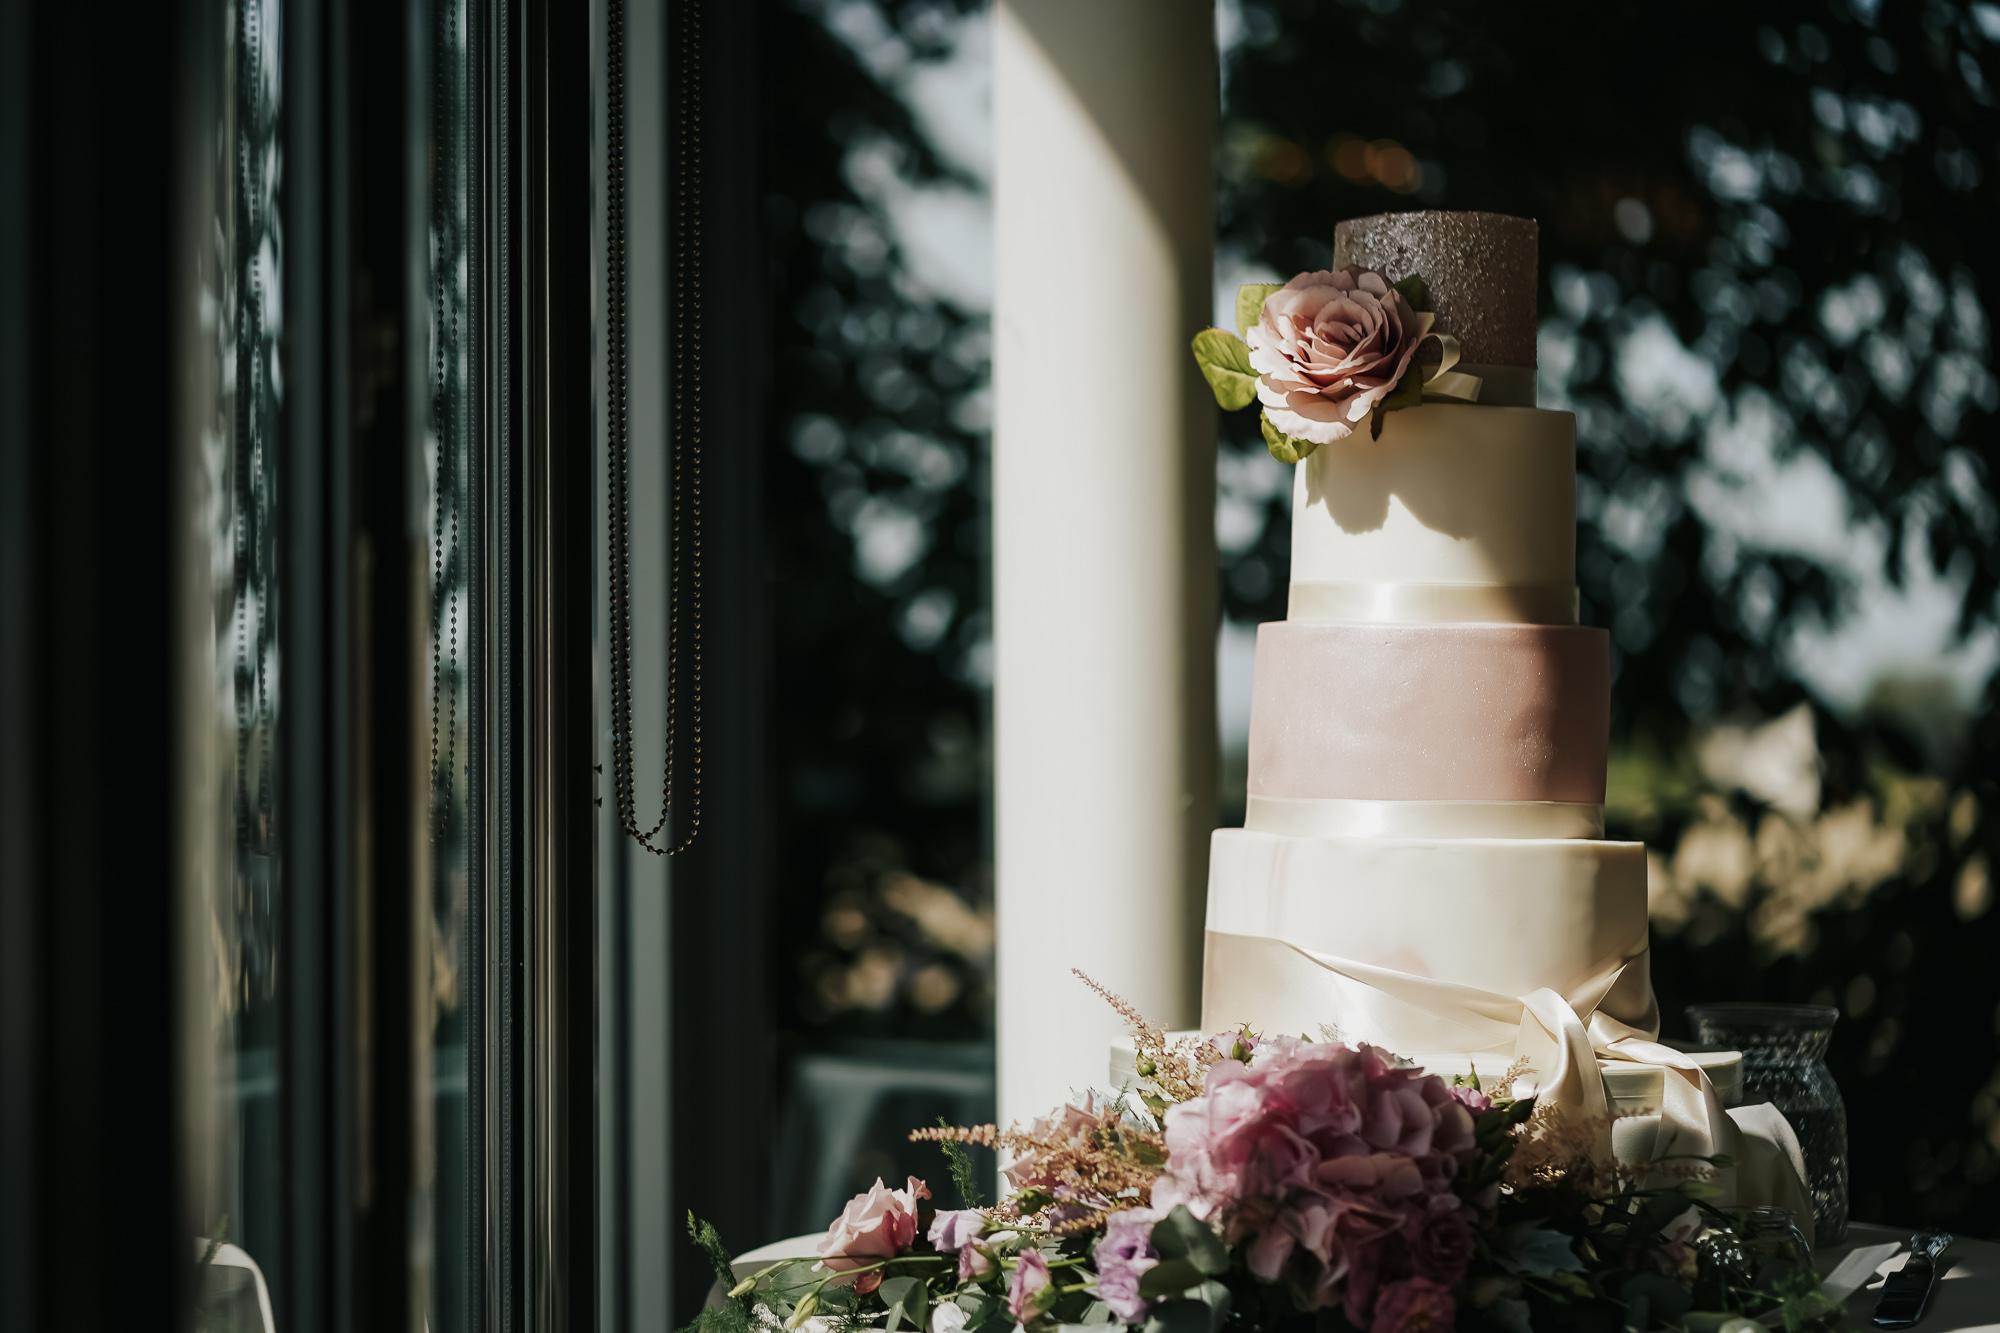 West Tower Wedding Venue Orkskirk Lancashire Wedding Photography cheshire wedding photographer (30 of 47).jpg